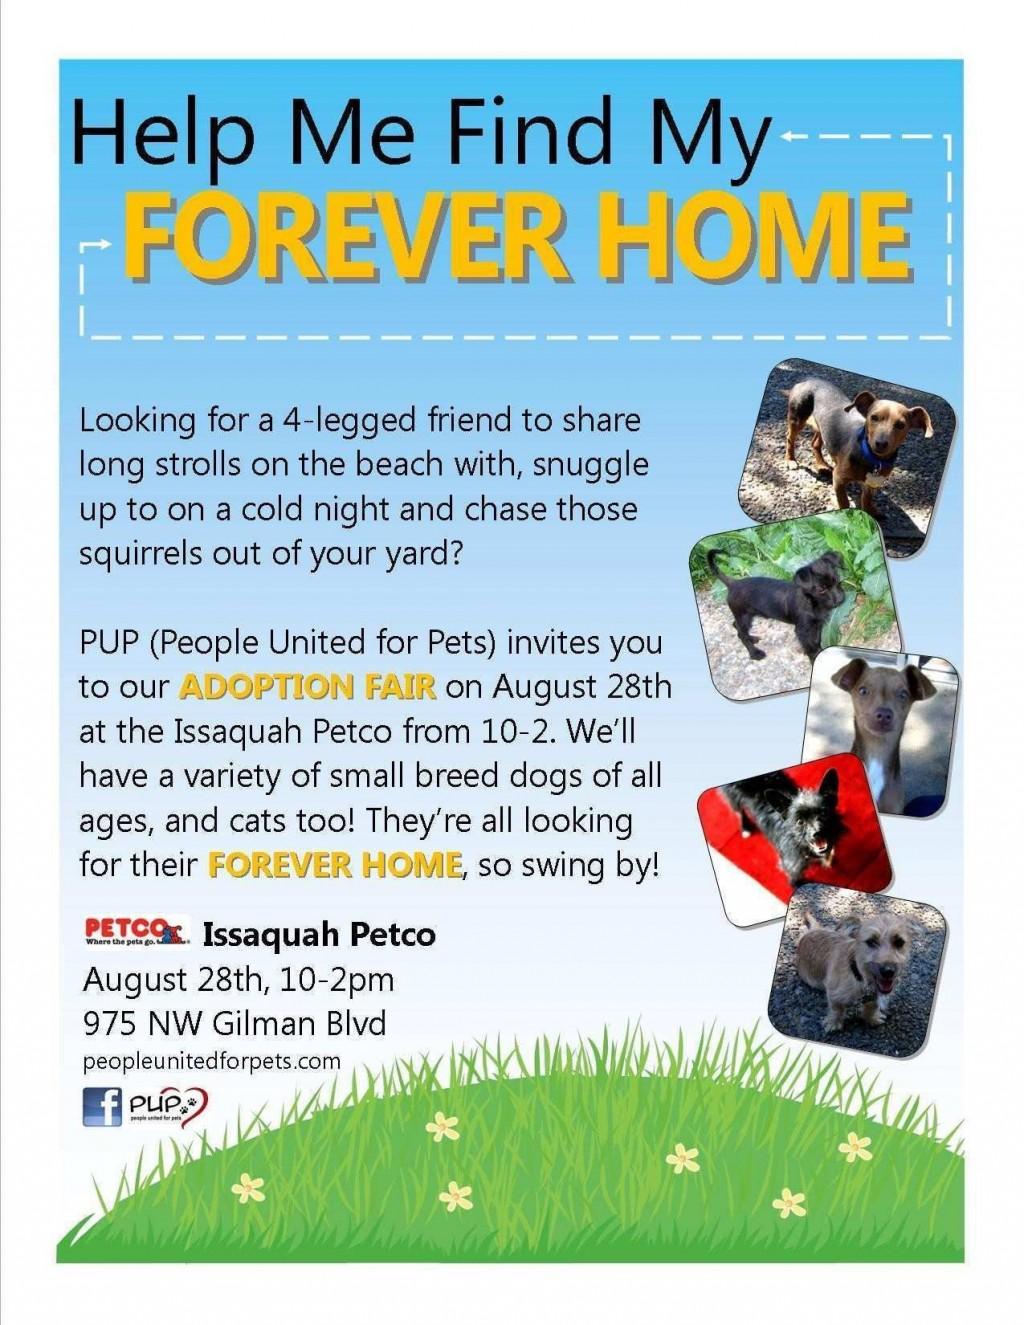 003 Phenomenal Pet Adoption Flyer Template Highest Quality  Free Event DogLarge